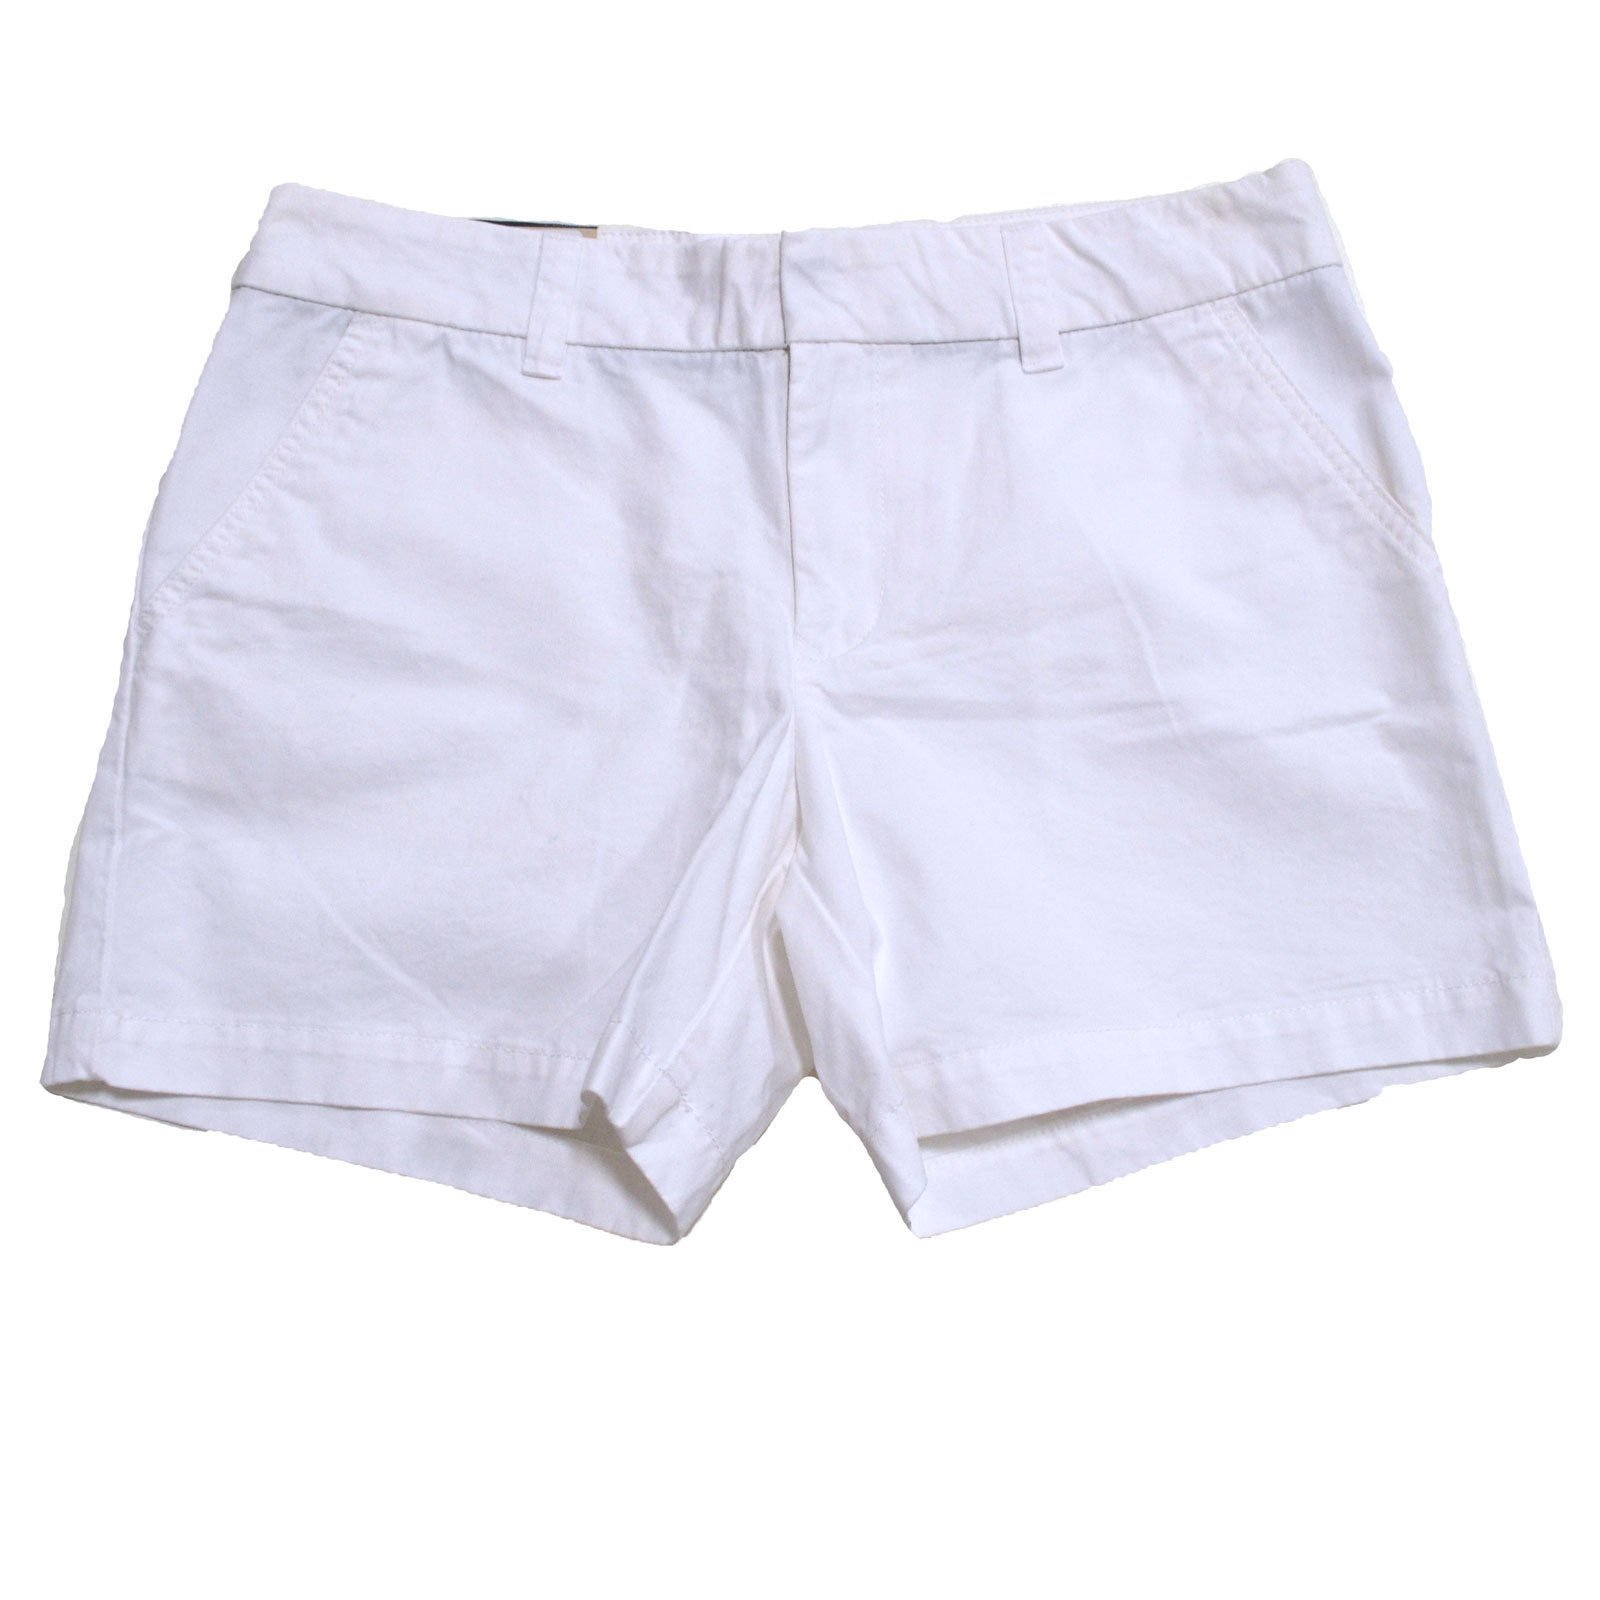 Tommy Hilfiger Womens Chino Shorts (White, 2)